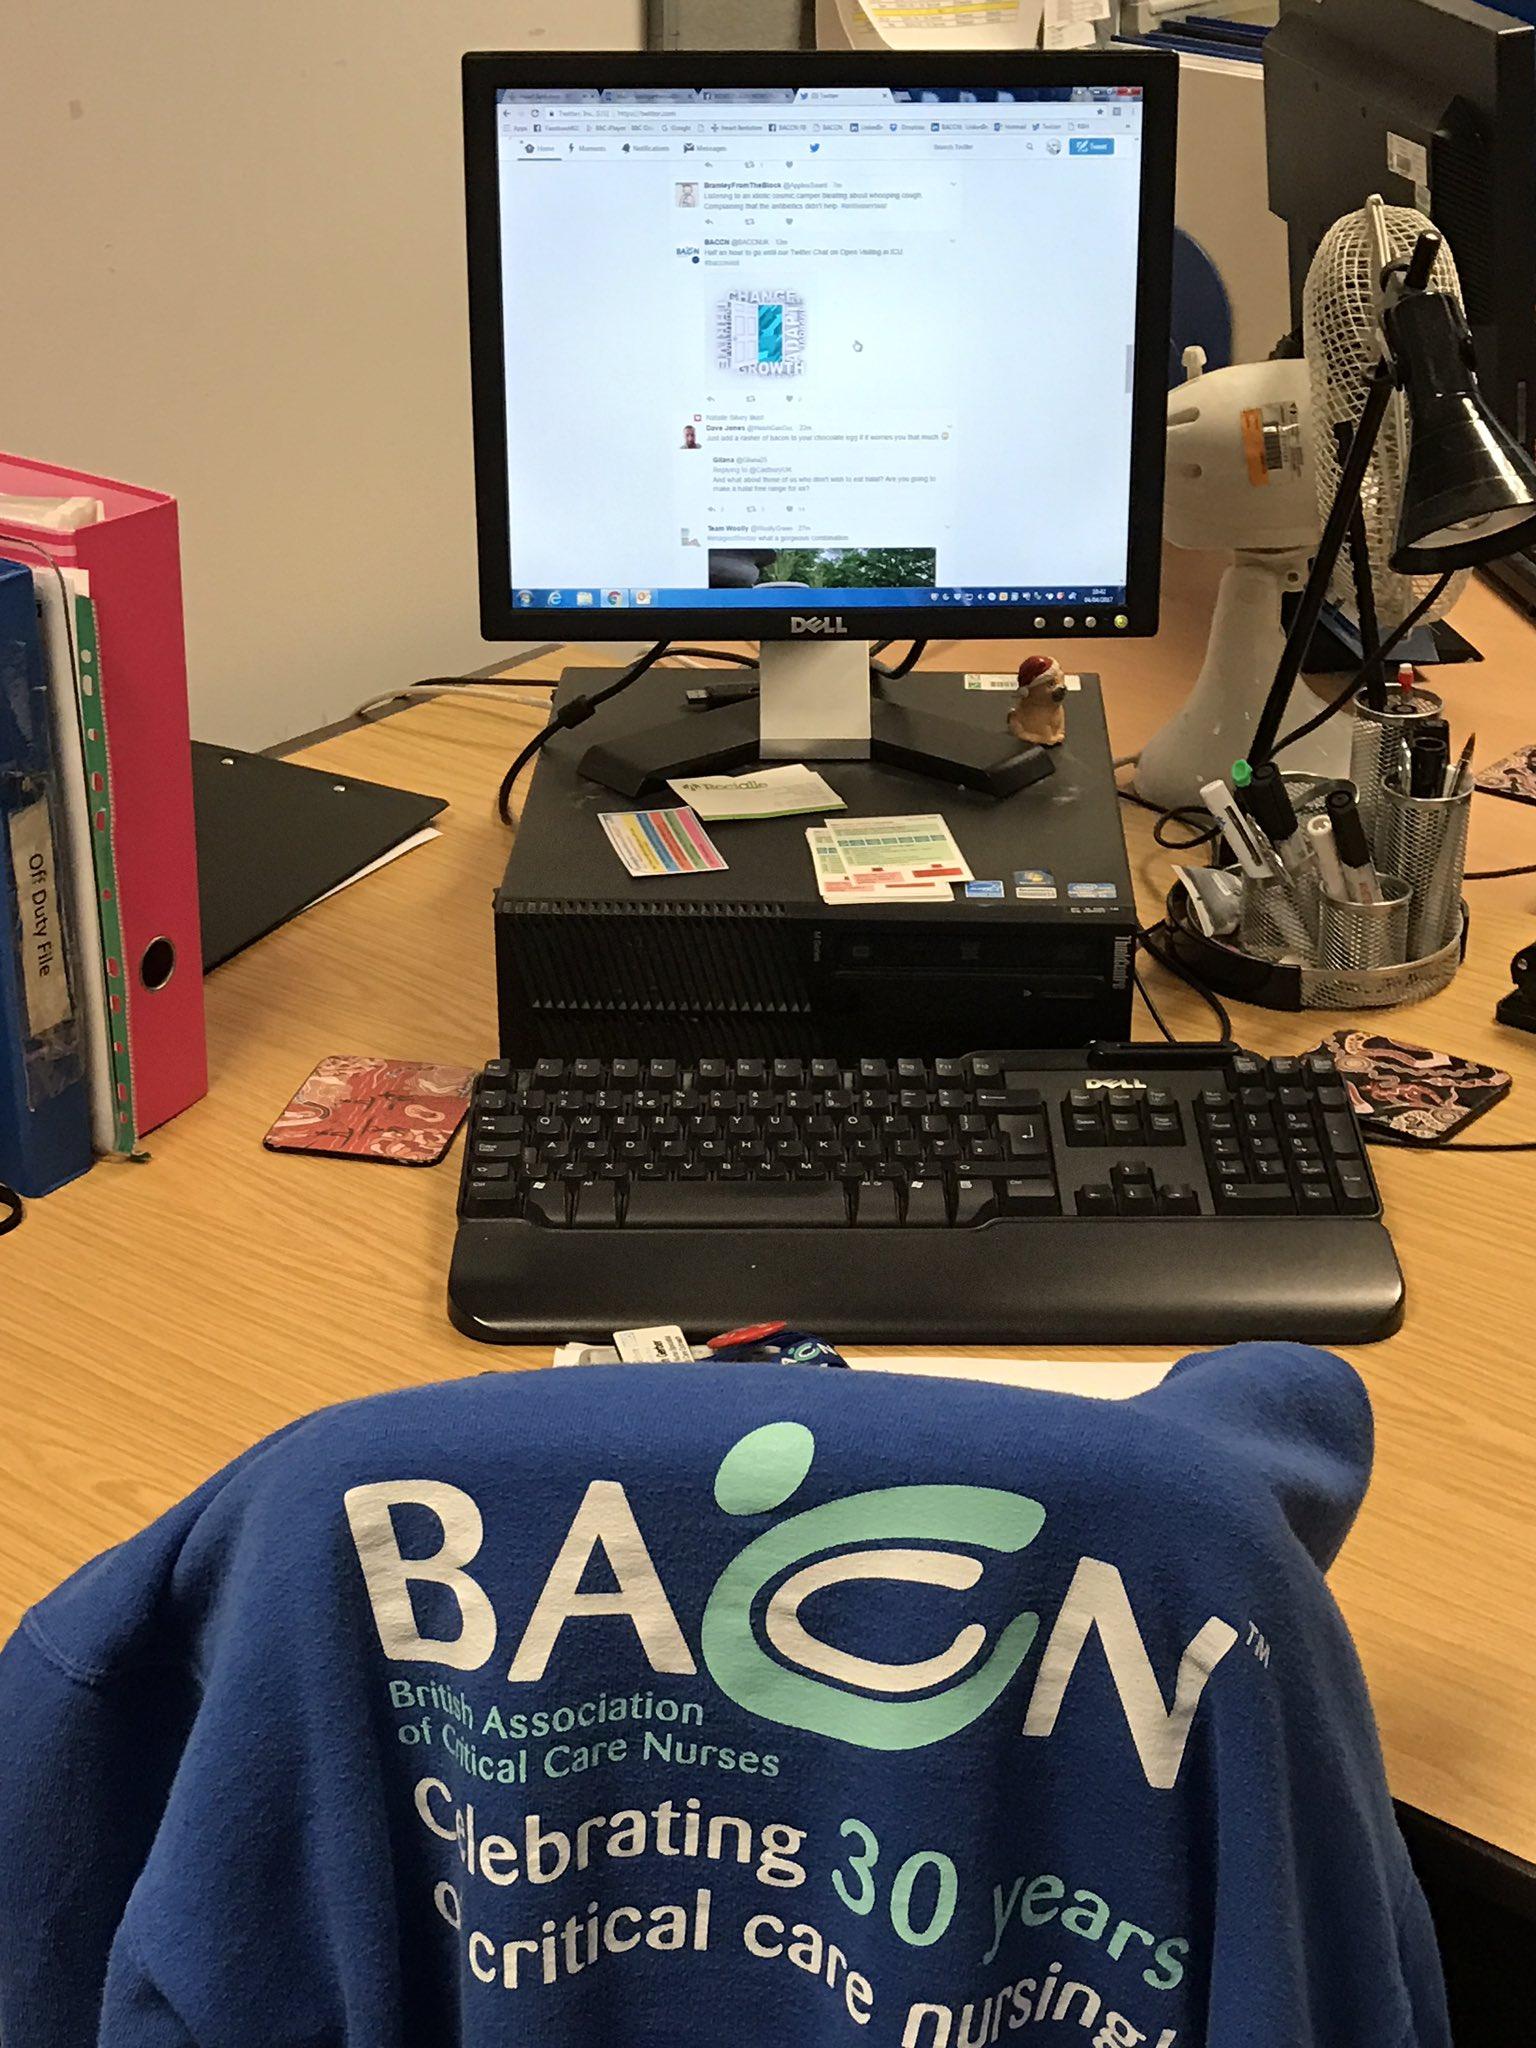 @BACCNUK I'm ready for tonight's #baccnvisit Twitter Chat👍 https://t.co/AIerlOhtqC